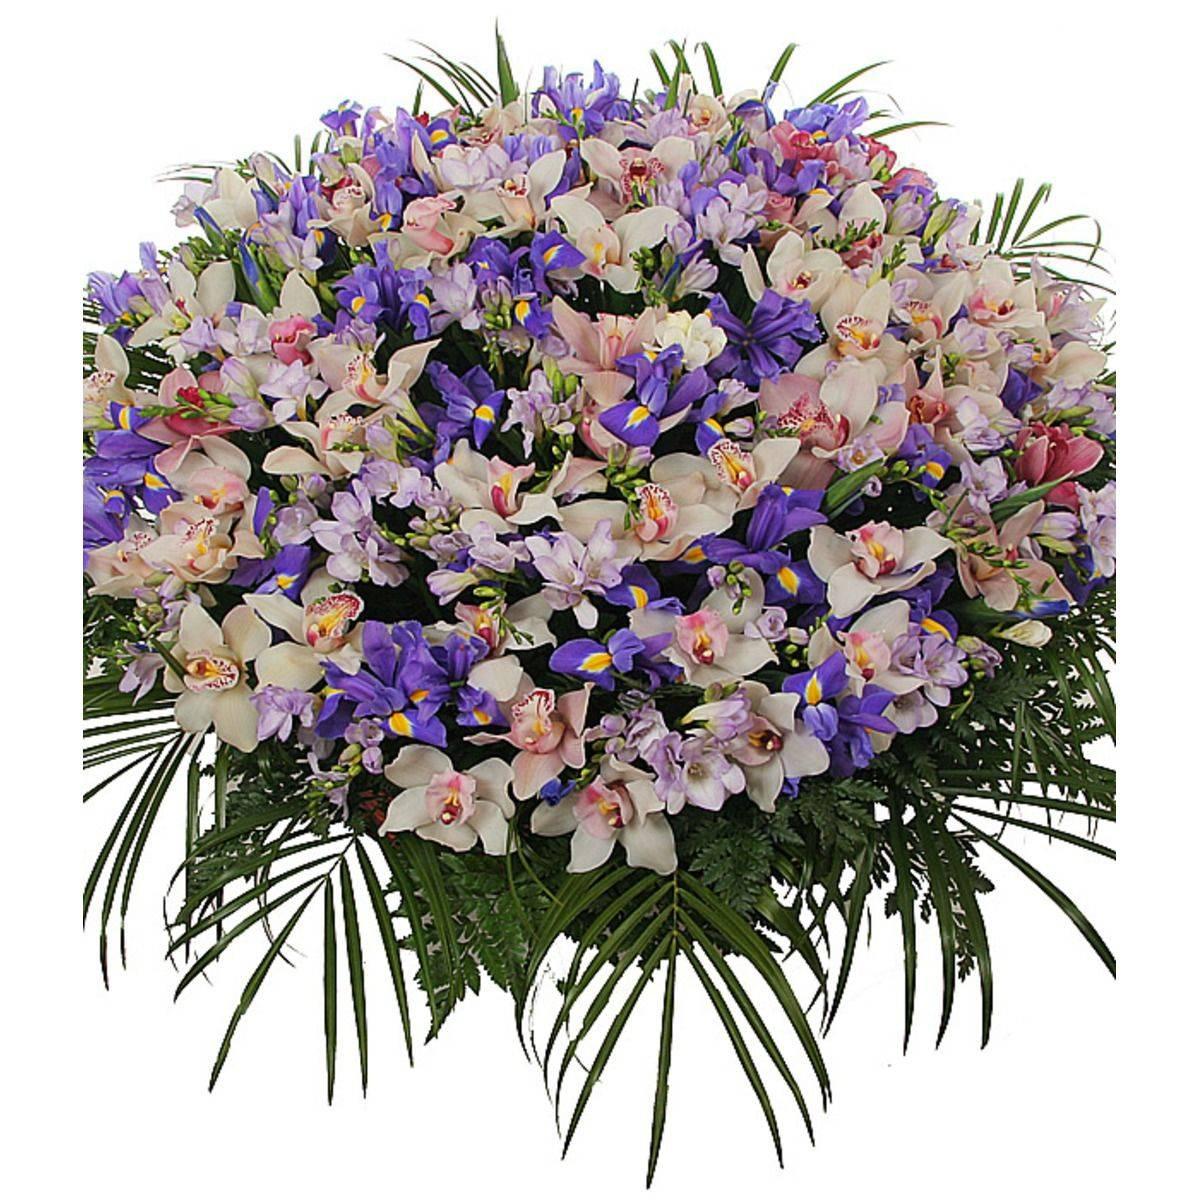 Особенности орхидеи и папоротника